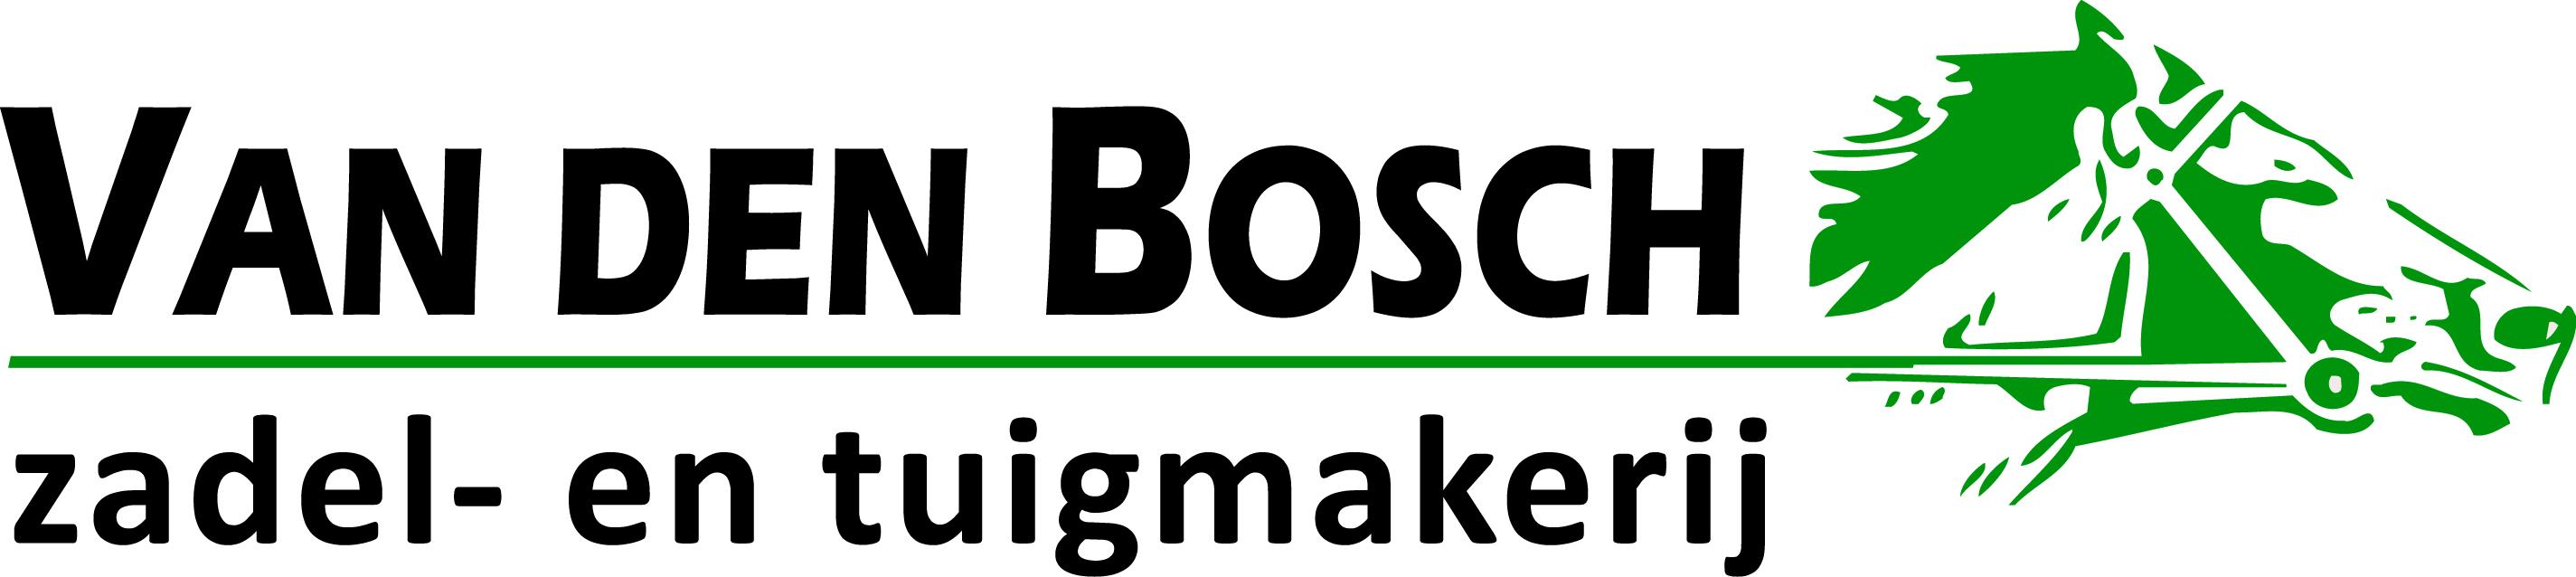 Zadelmakerij vd Bosch